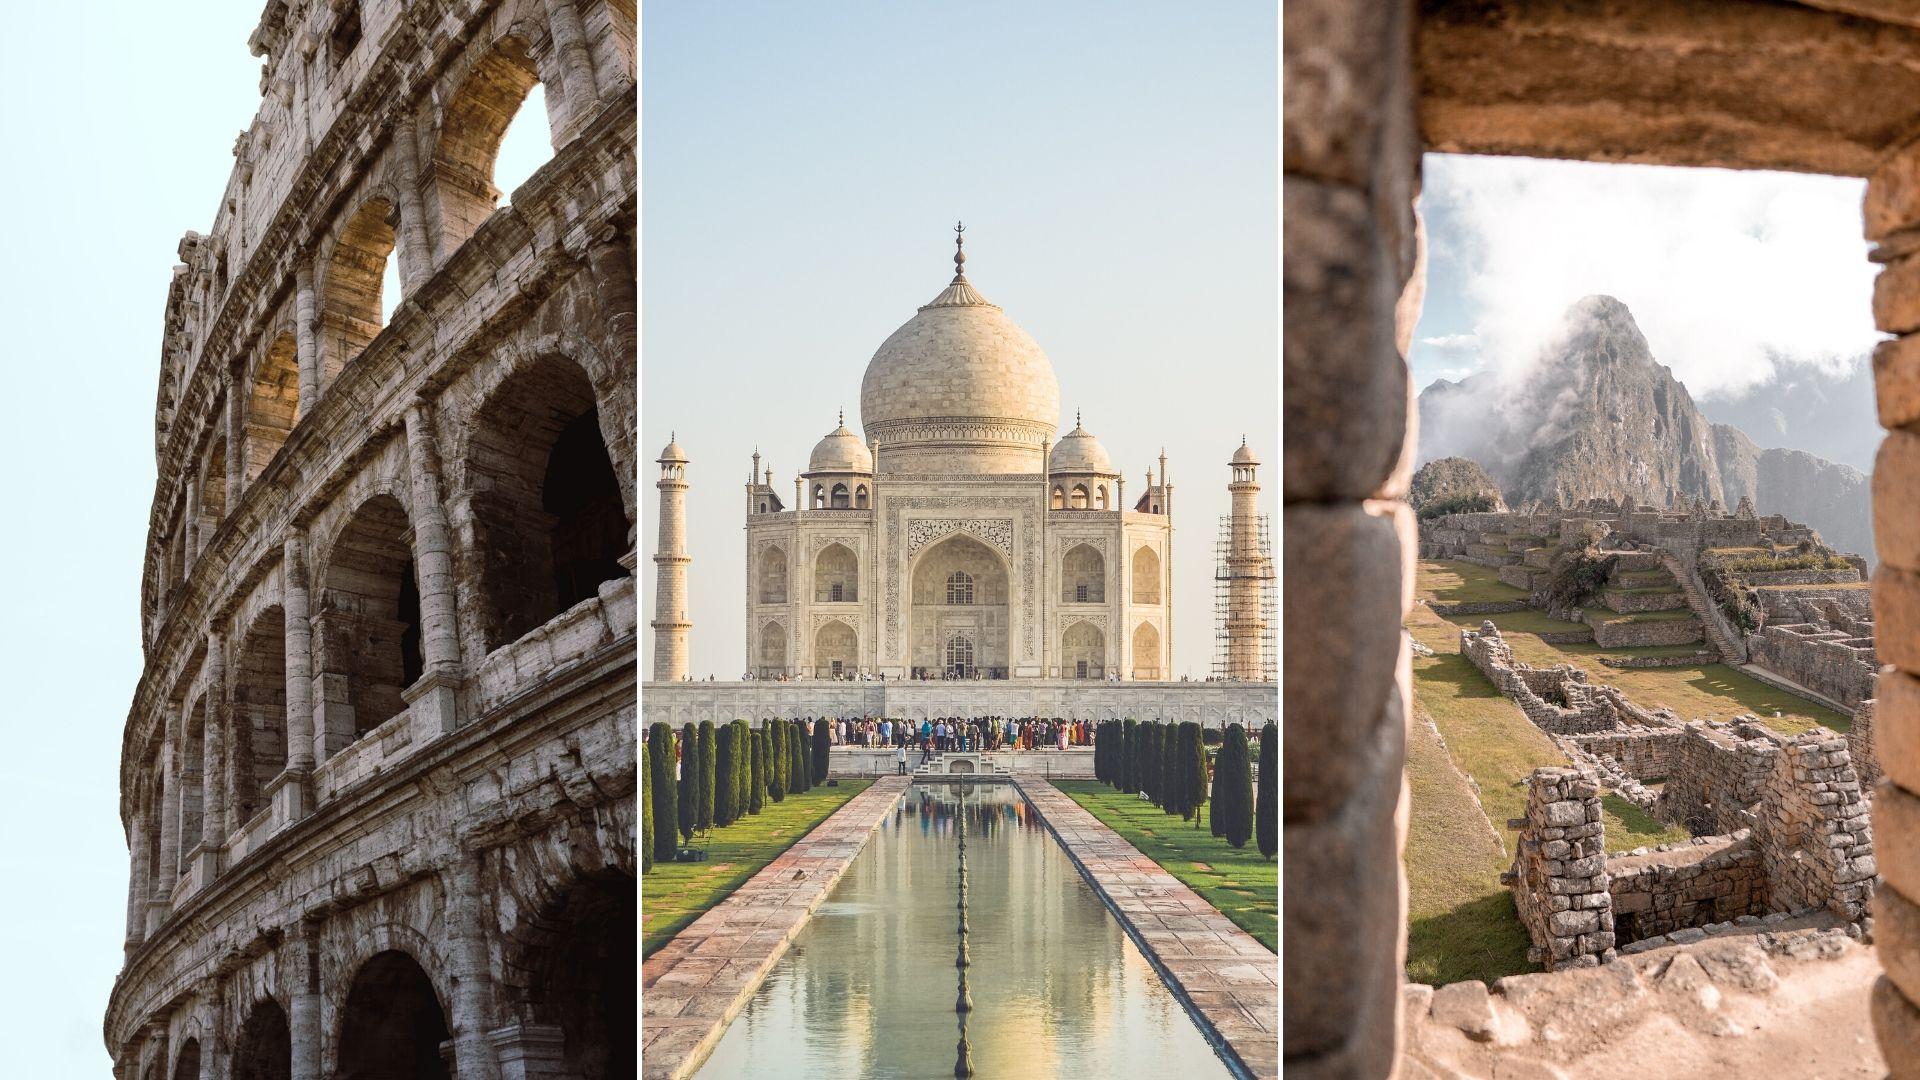 taj mahal, great wall of china, lockdown, india lockdown